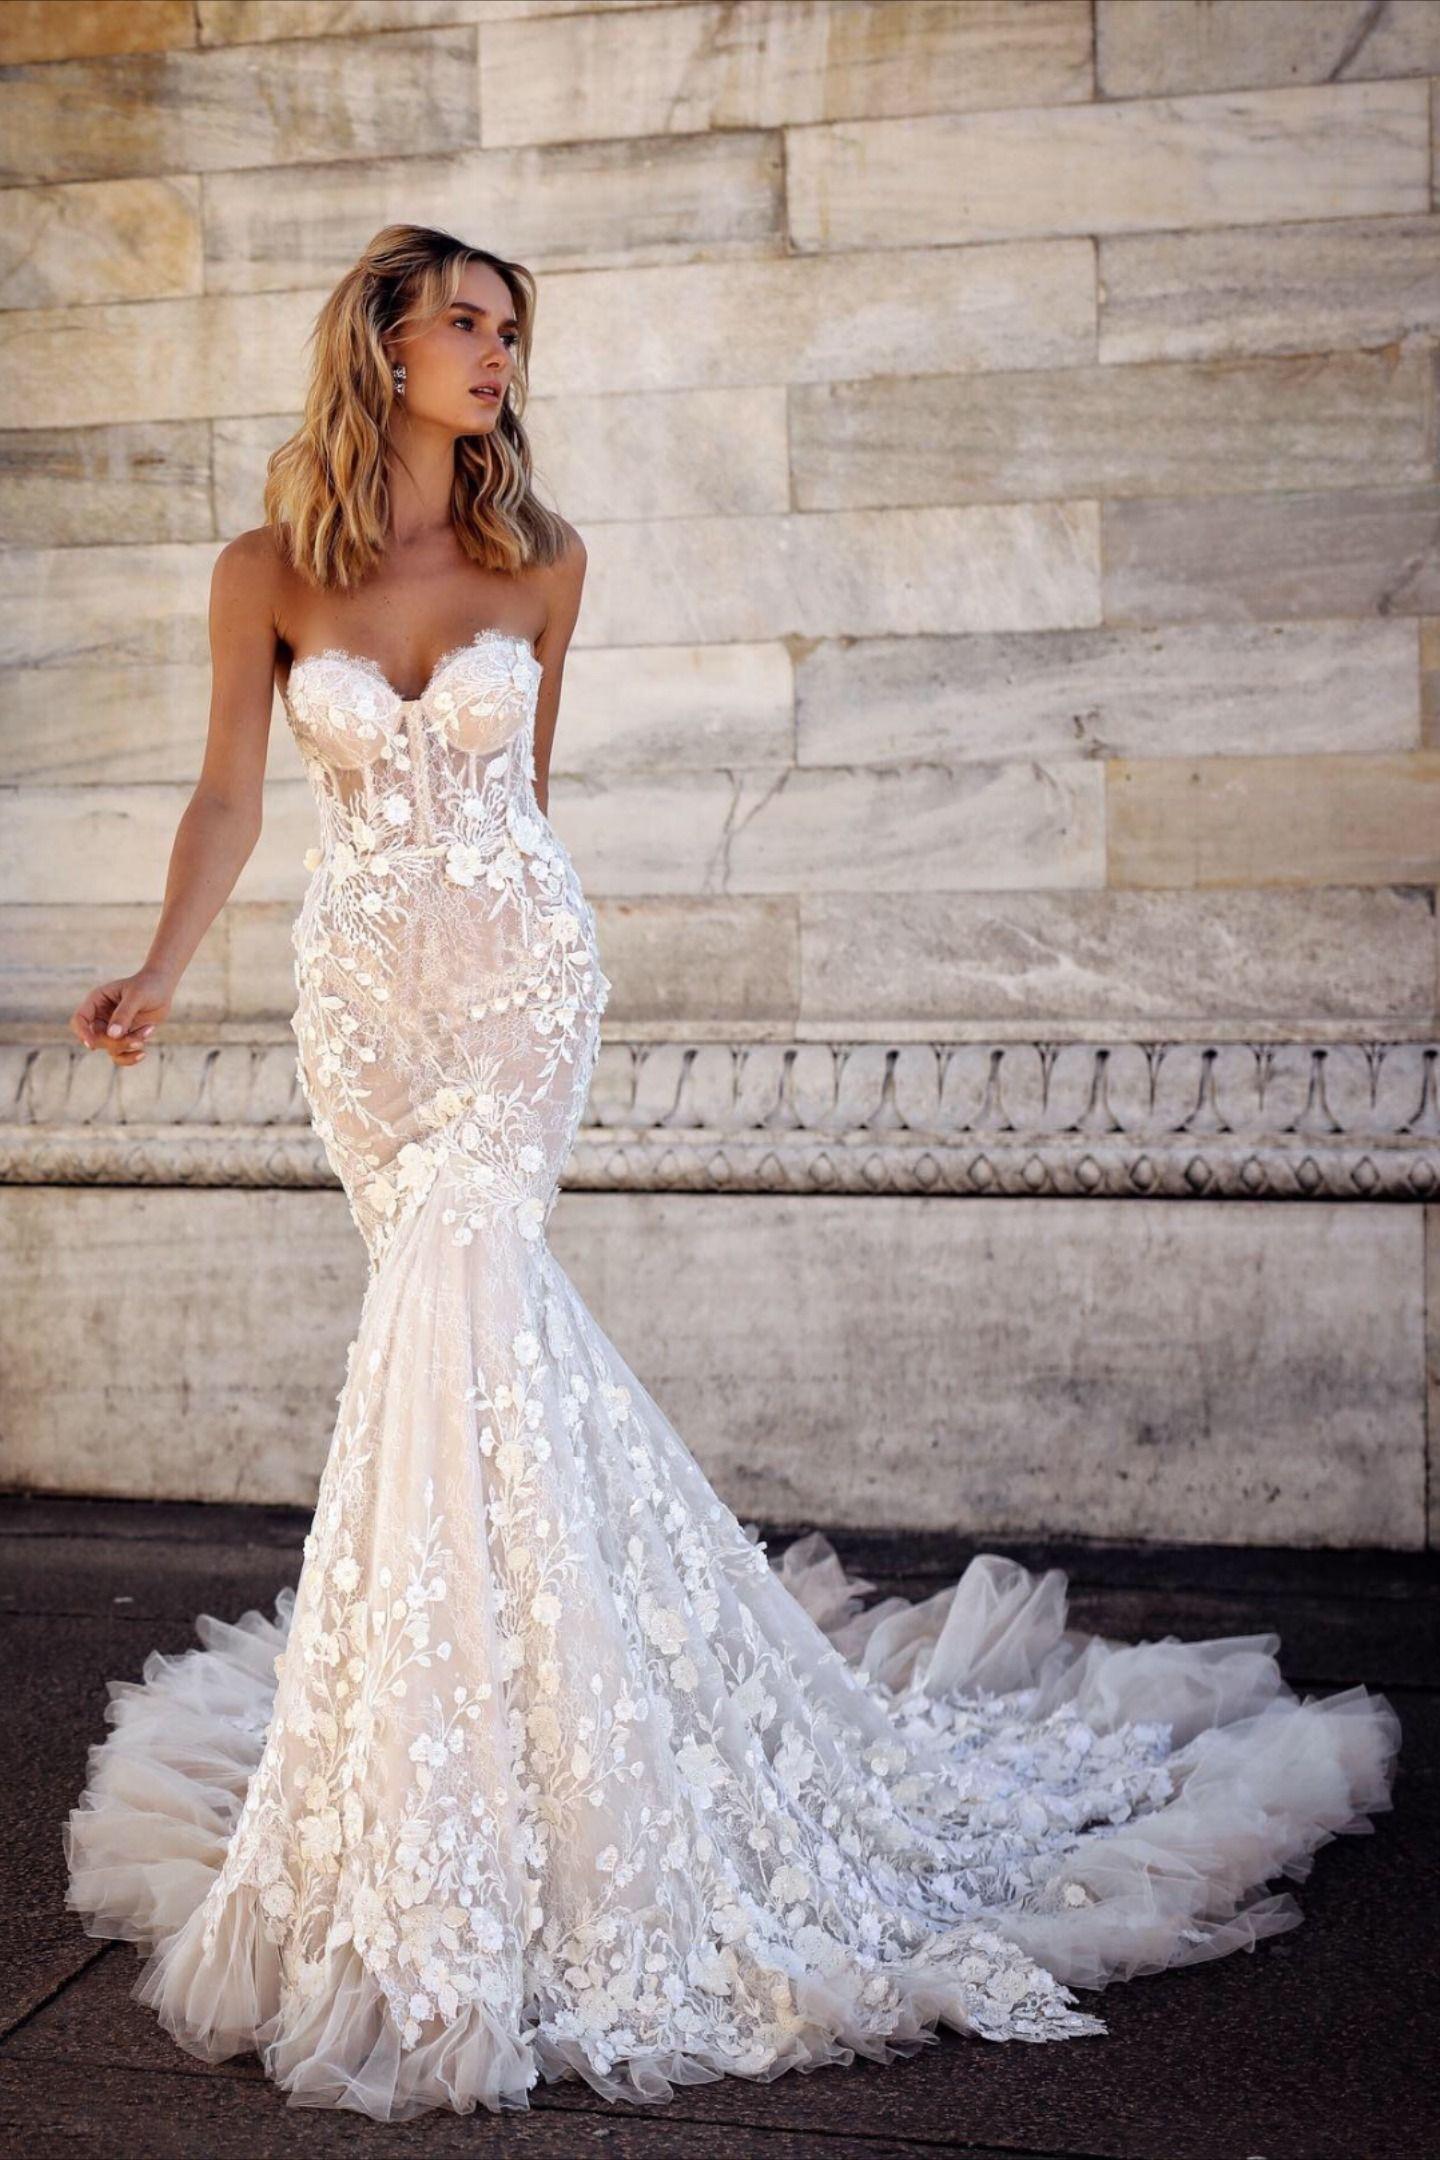 Mermaid Gown Goals By Berta Milano Wedding Dresses Lace Backless Wedding Dress Wedding Dress Trends [ 2160 x 1440 Pixel ]